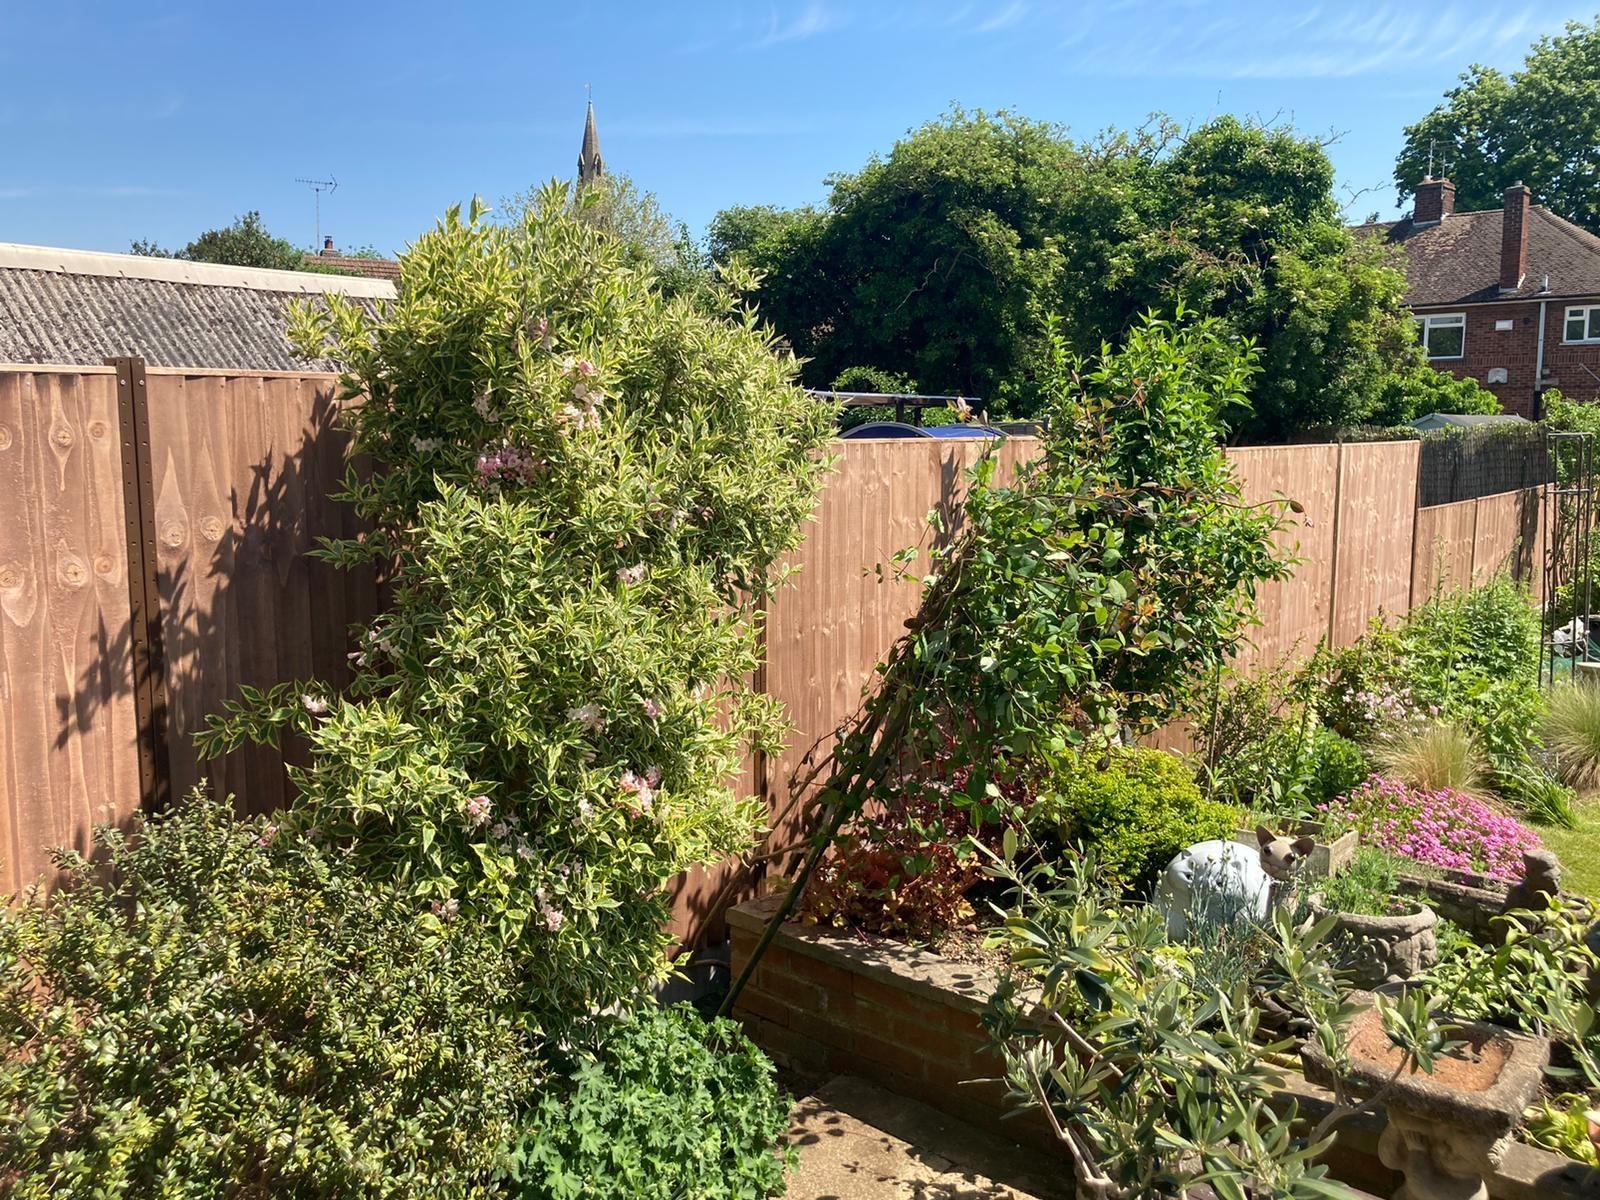 Durapost fencing with concrete gravel boards (Peterborough) 3